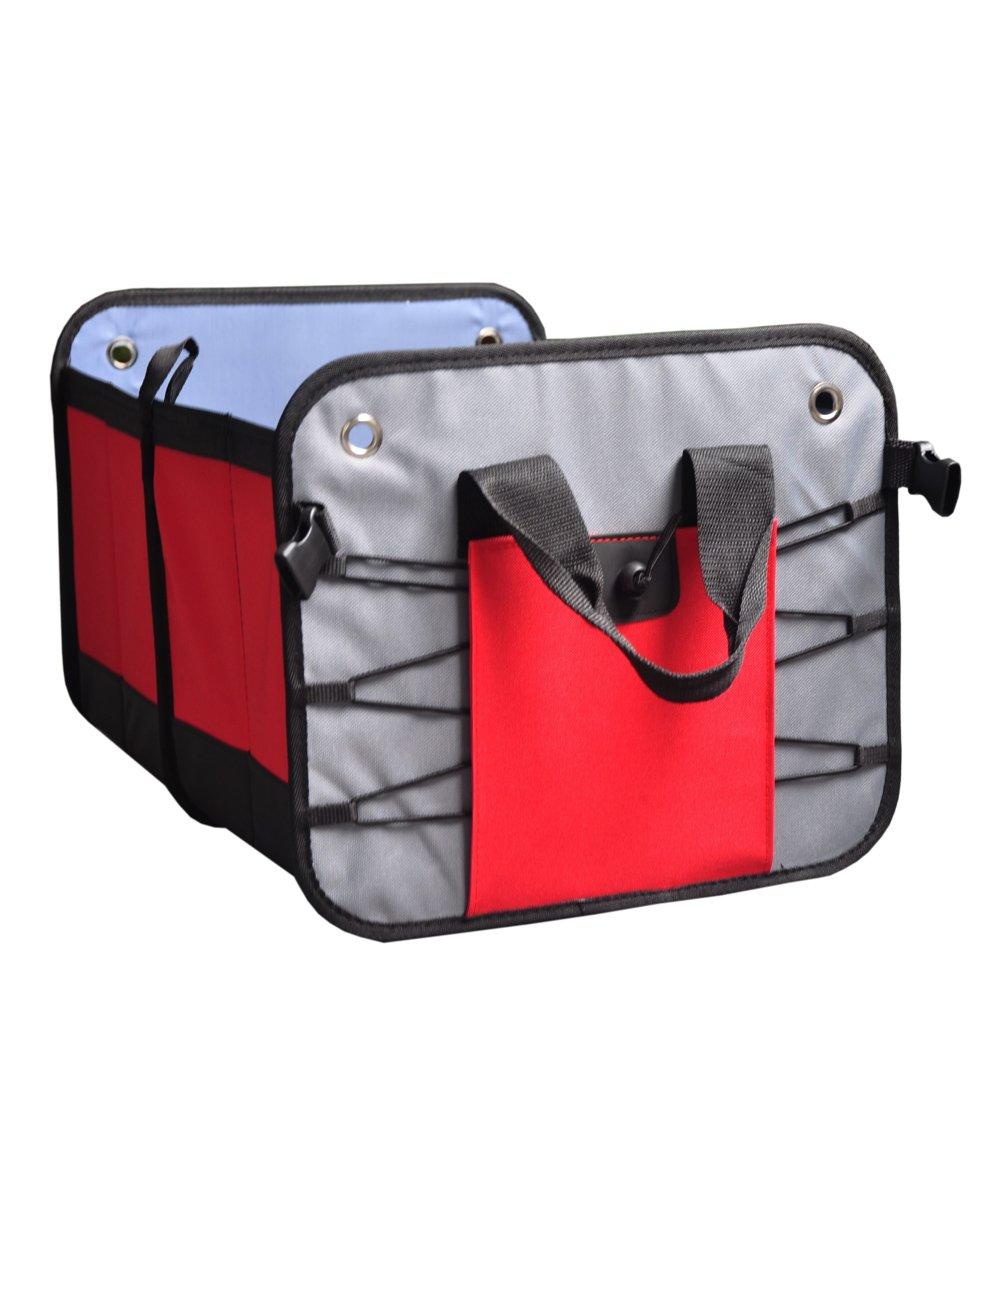 Galexbit Compartments Trunk Organizer Collapsible bag Portable storage Multi